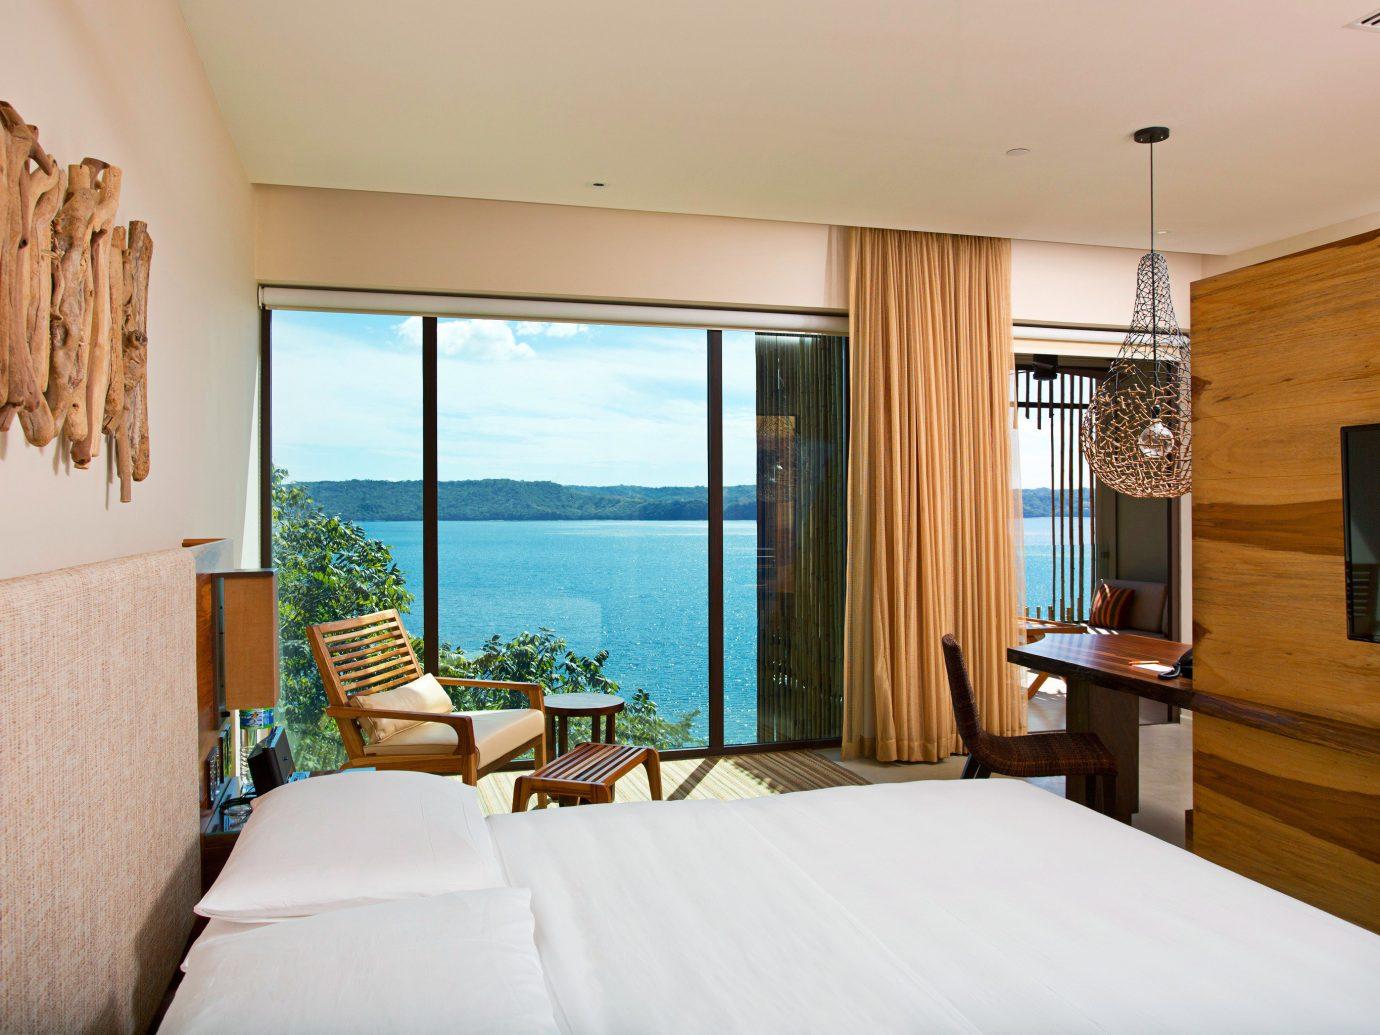 Bedroom At Andaz Hotel Papagayo In Costa Rica